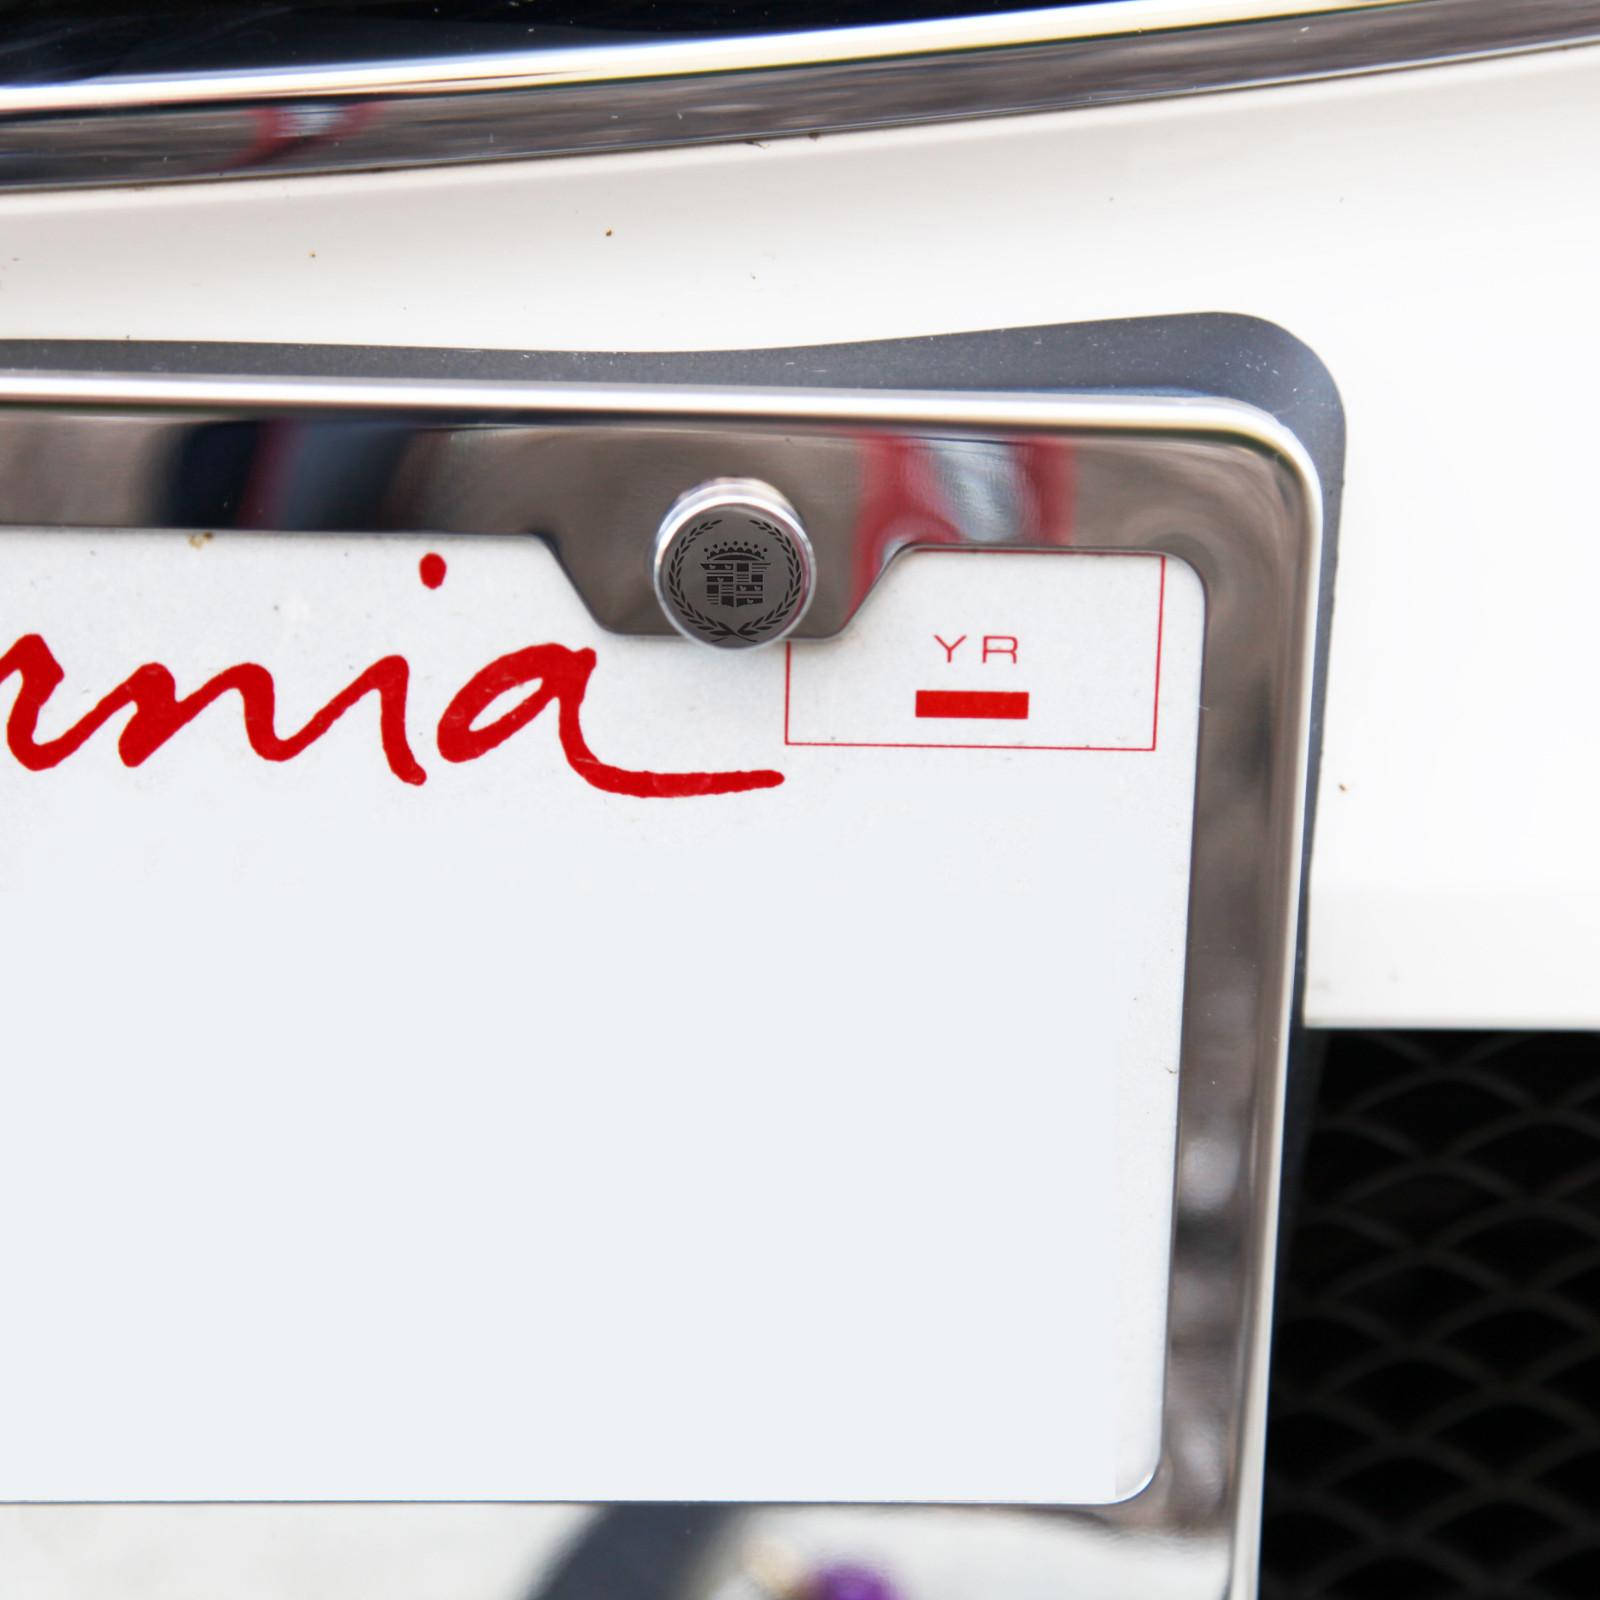 Laser Etched Black Cadillac License Plate Frame Bolts Fastener Chrome Screws Cap